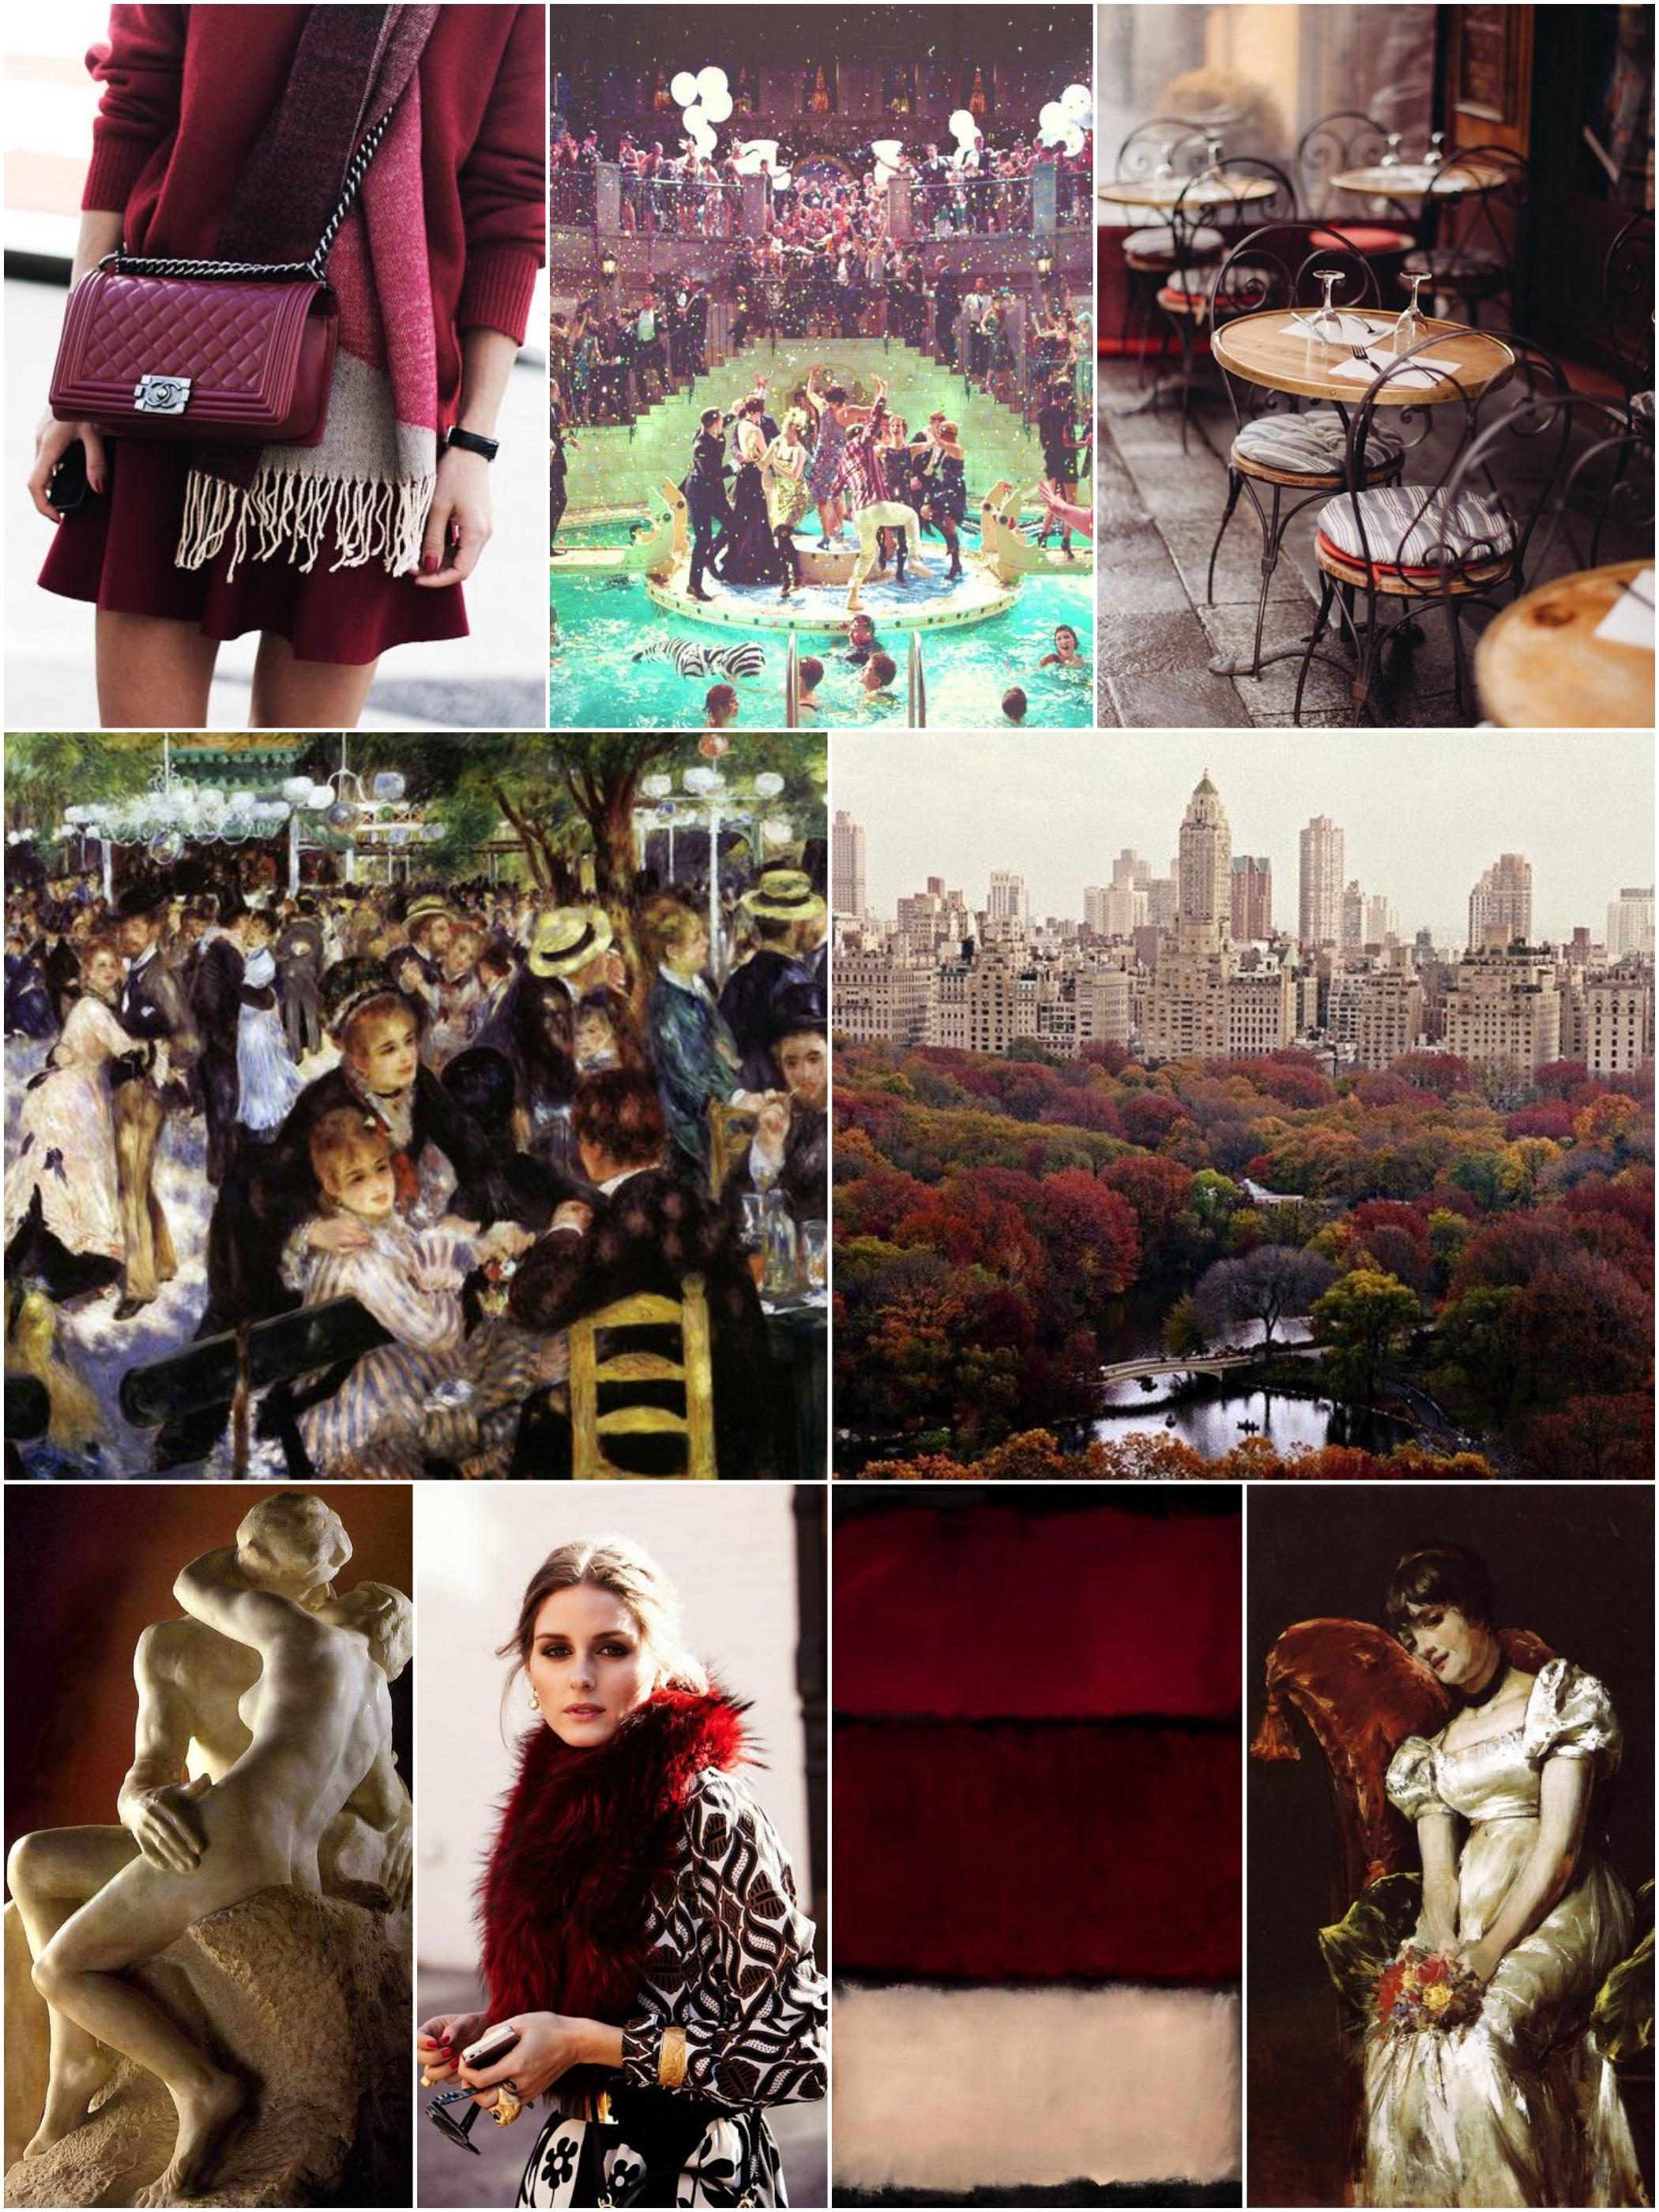 Photos (clockwise from upper left):  Sheerluxe  |  Mery  |  TimeOut  |  Strikes Our Fancy  |  Renoir  |  Rothko  | The OP Lookbook  |  The Kiss  |  Le Moulin de la Galette